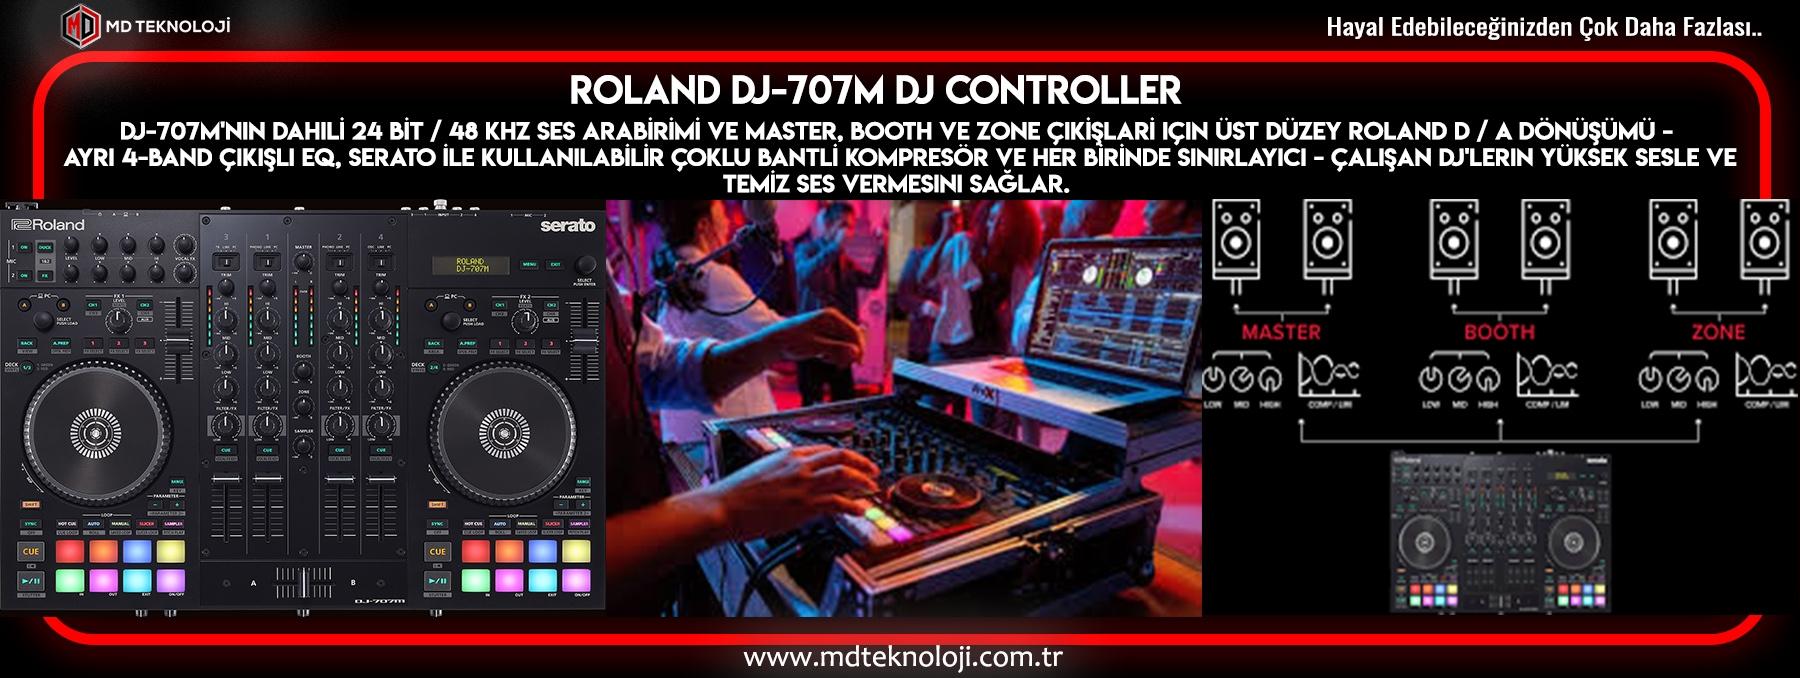 ROLAND DJ-707